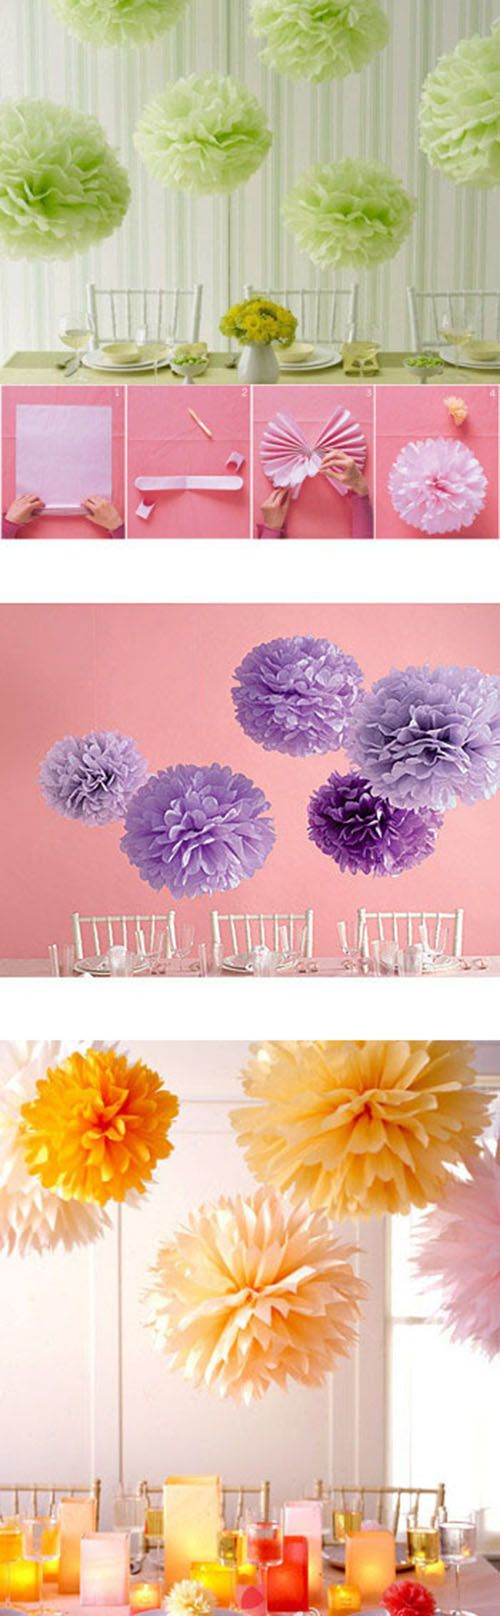 Diy Beautiful Paper Ball  DIY u Crafts Tutorials  cute diy flower